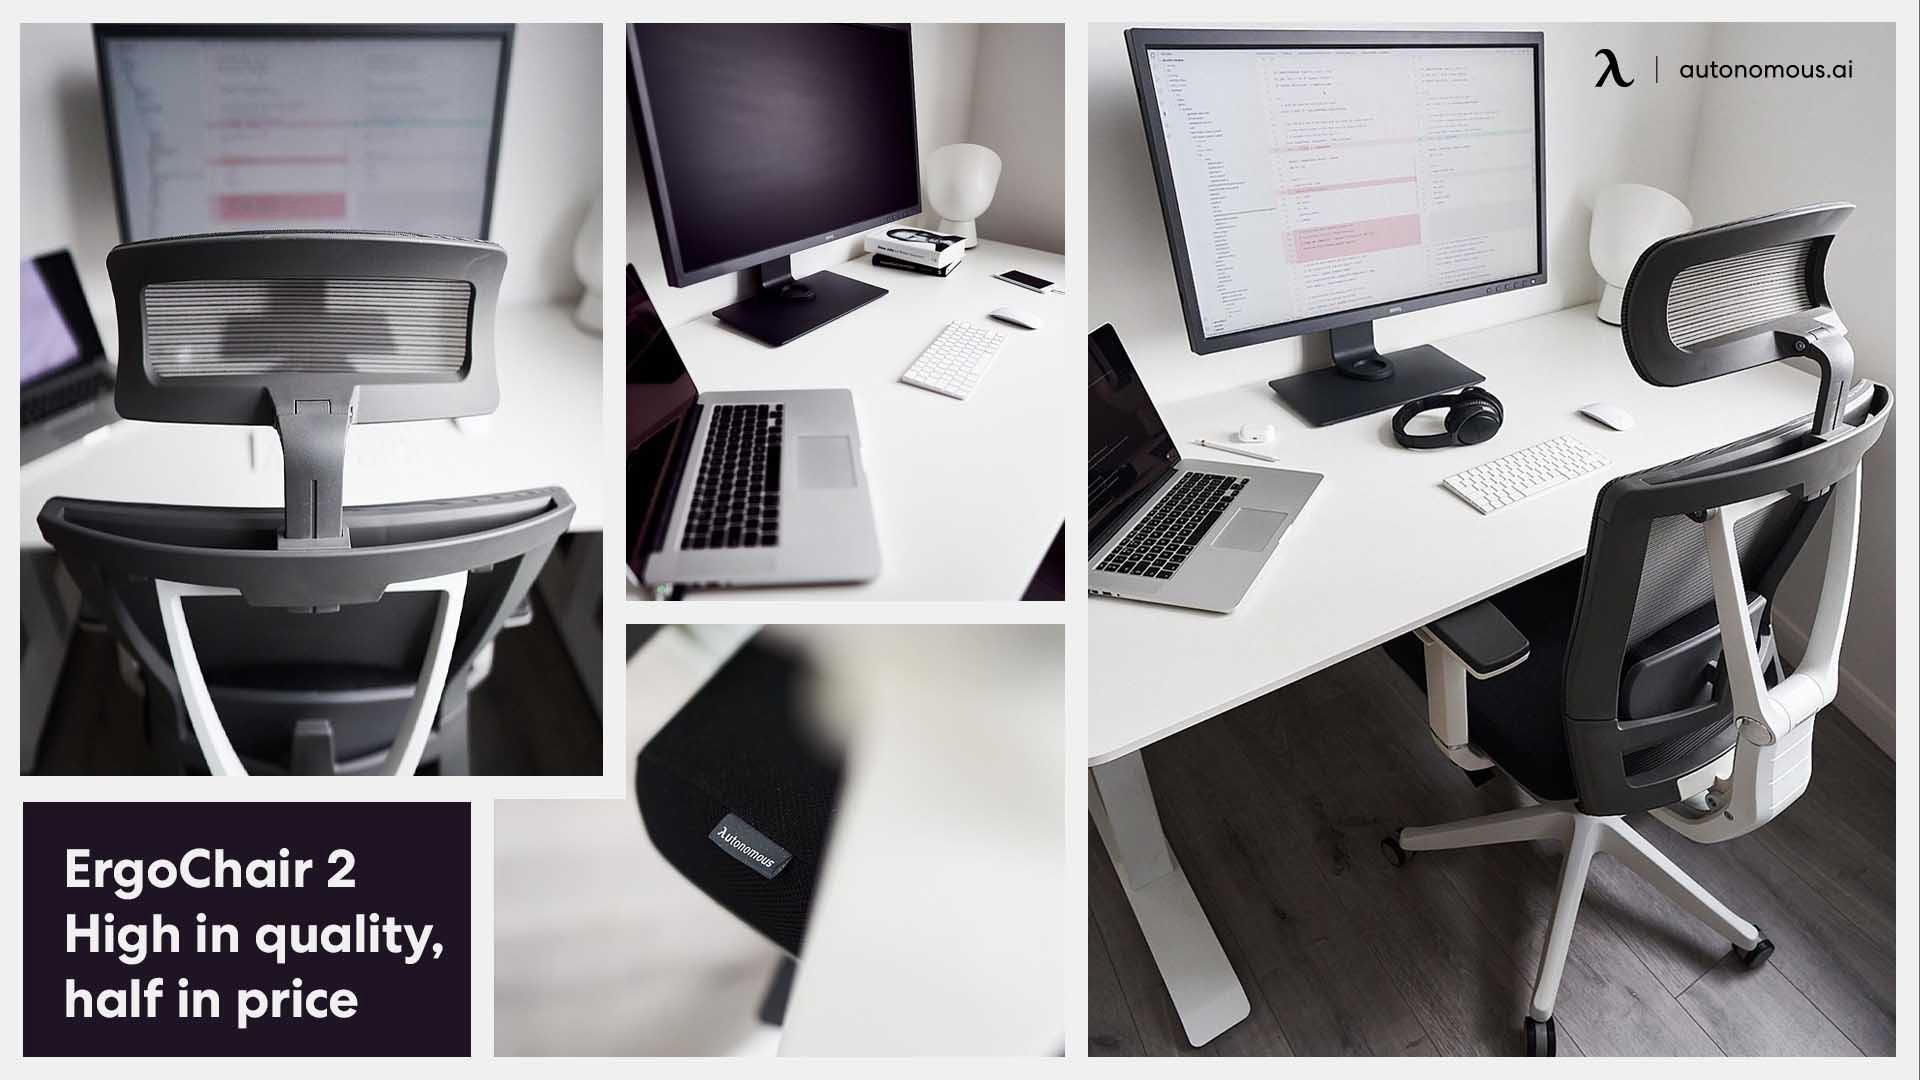 Photo of student desk set up ErgoChair 2 from Autonomous